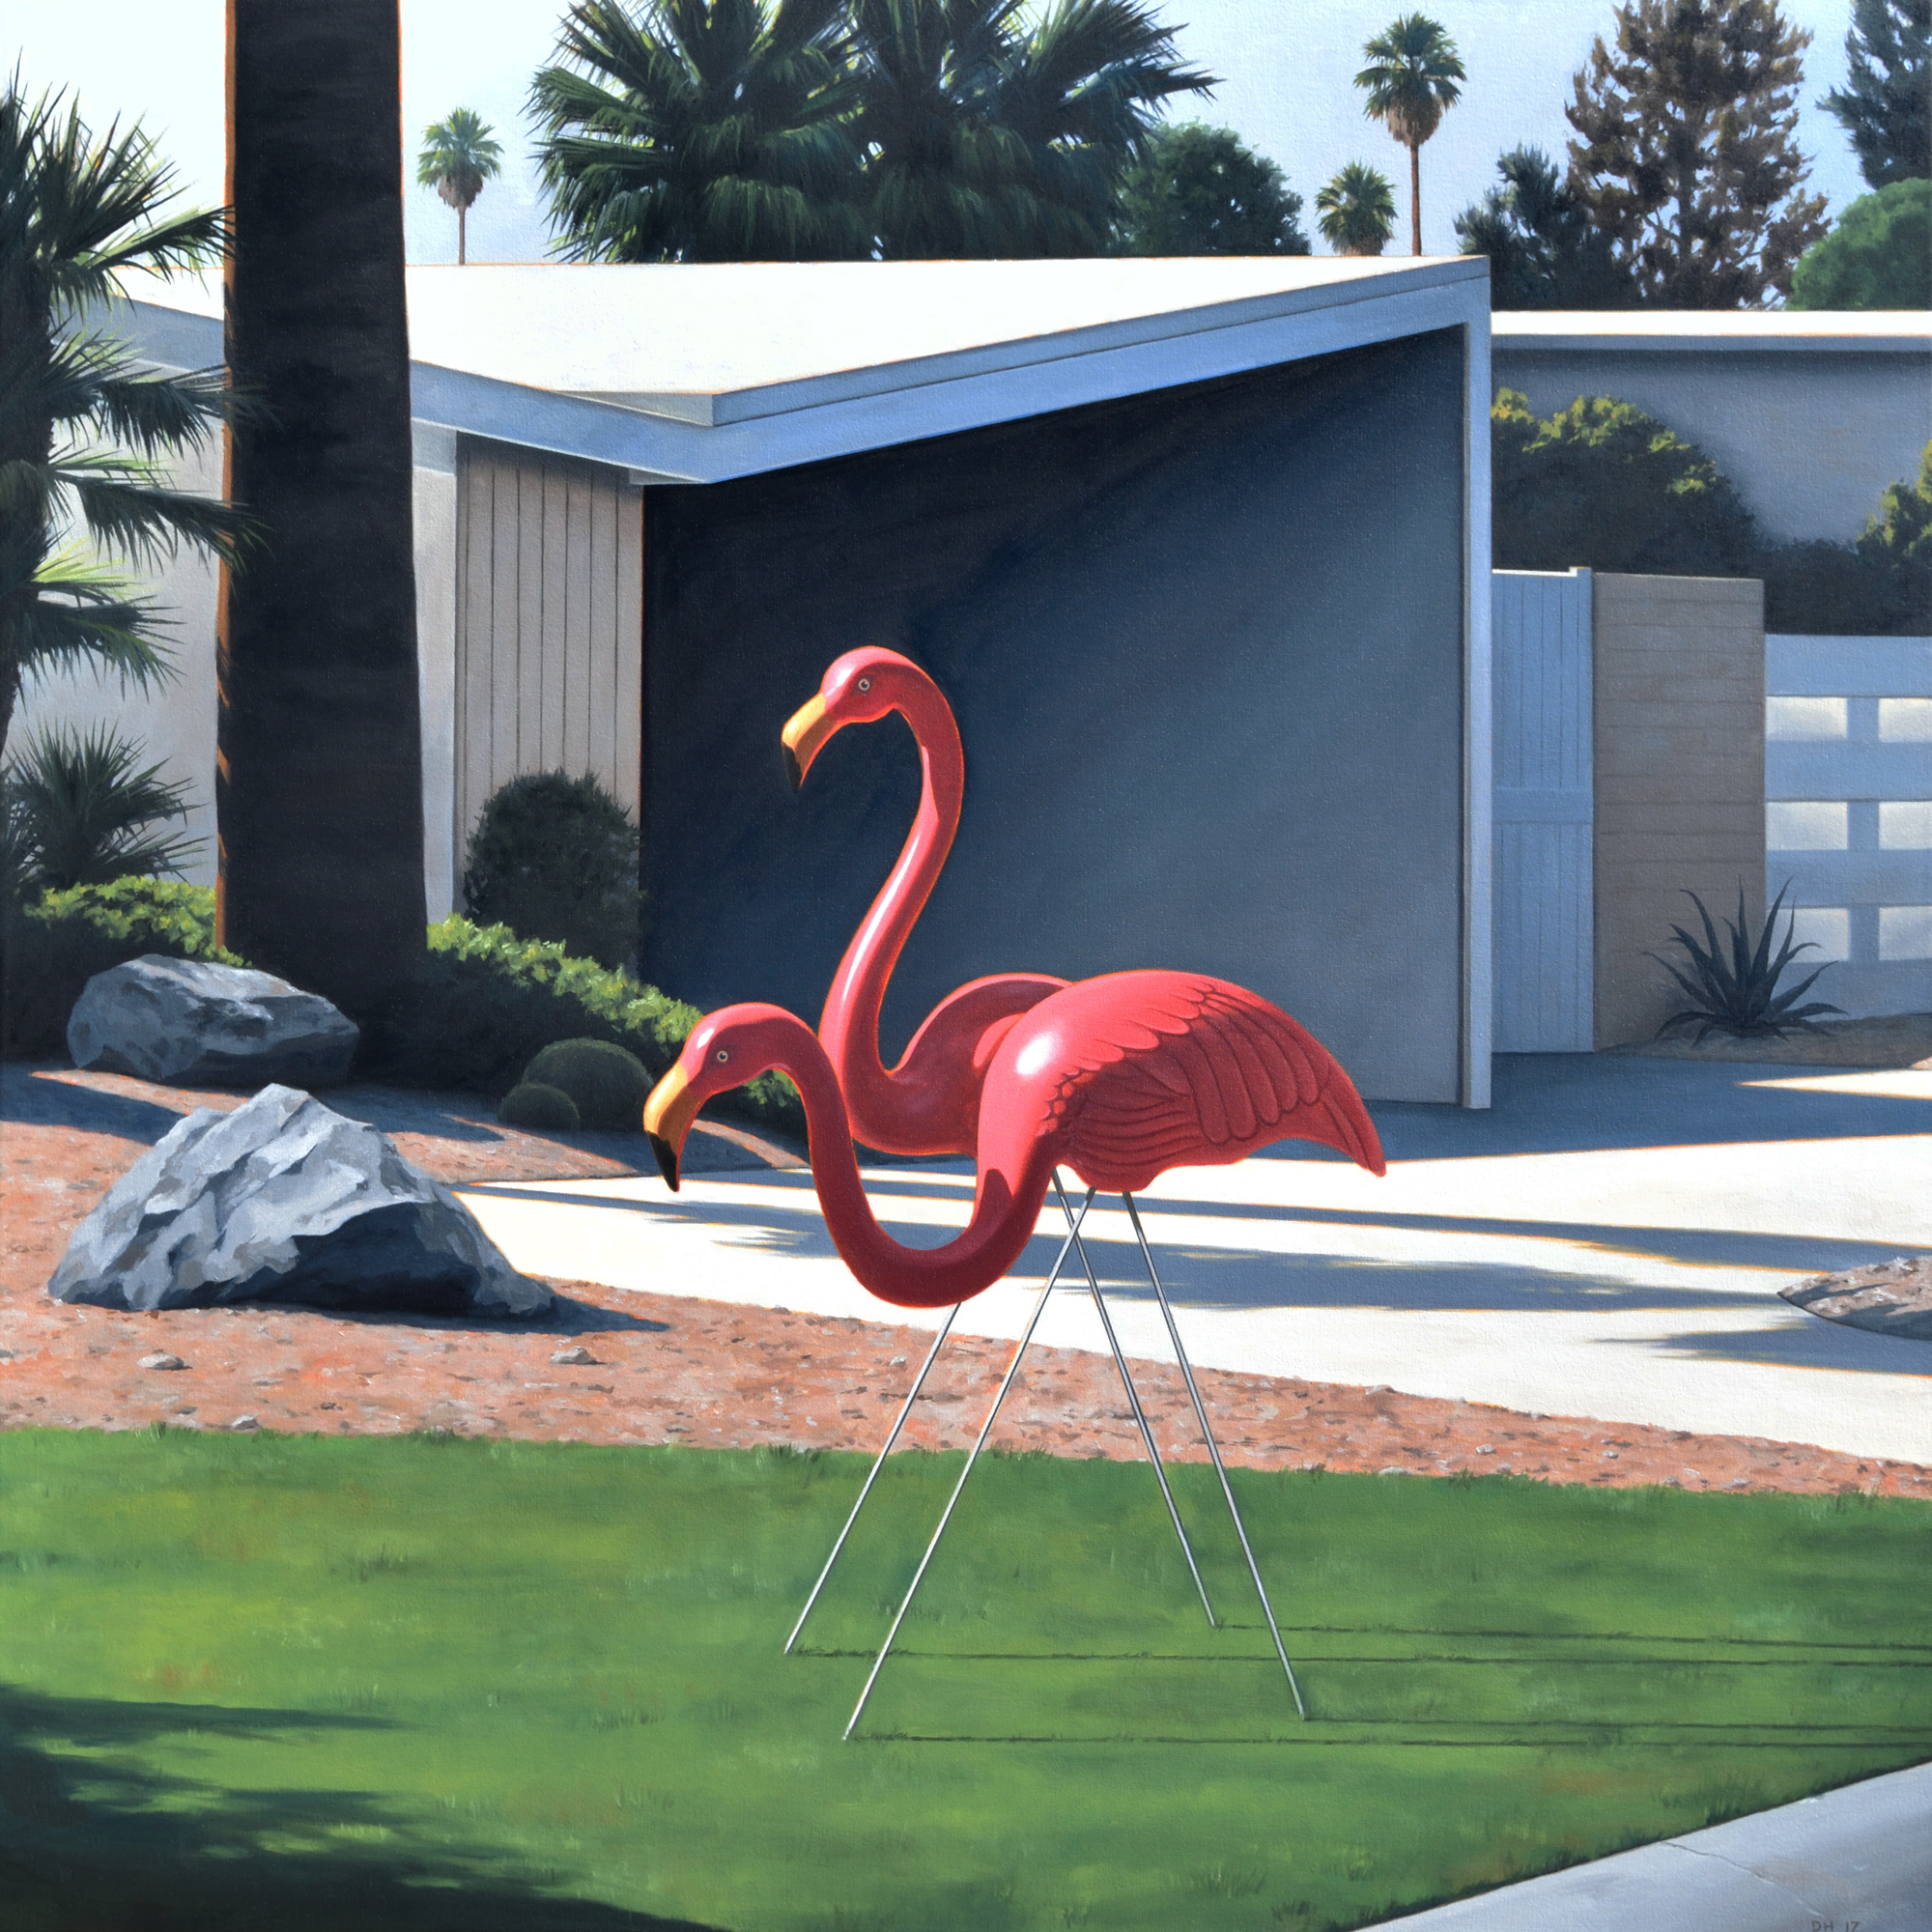 Morning Lawn Flamingos